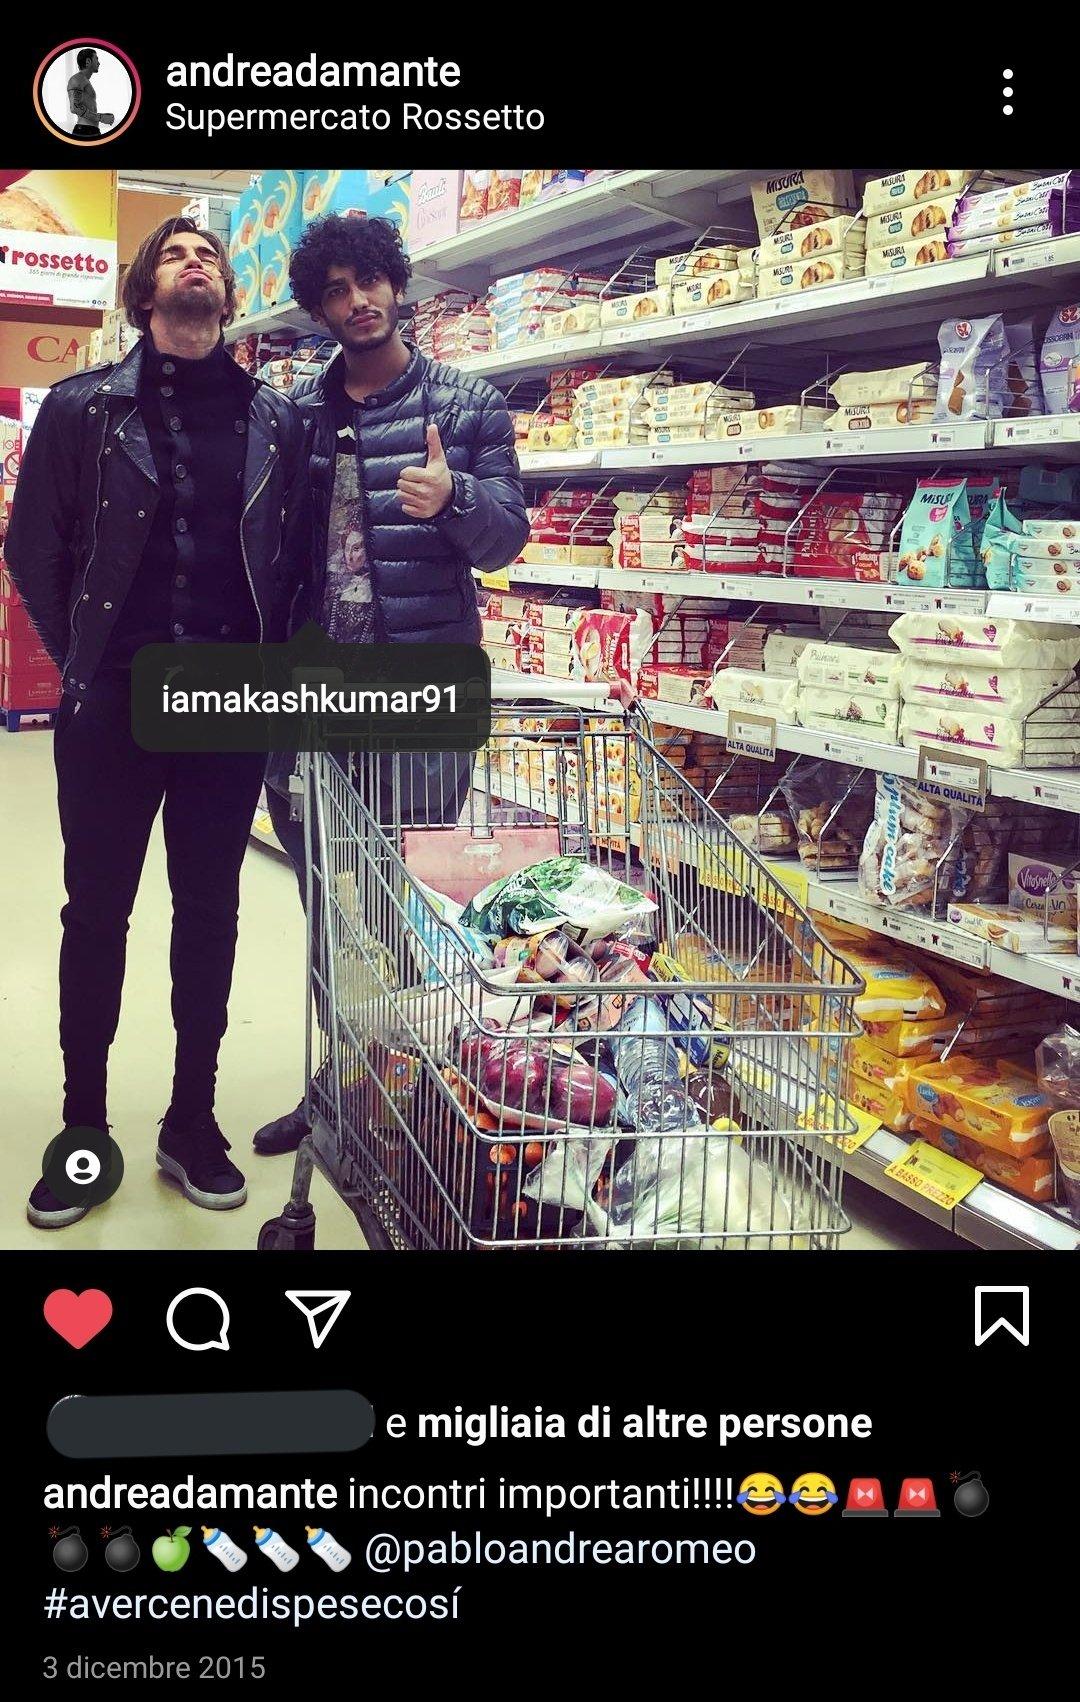 Akash Kumar nome falso Andrea Damante